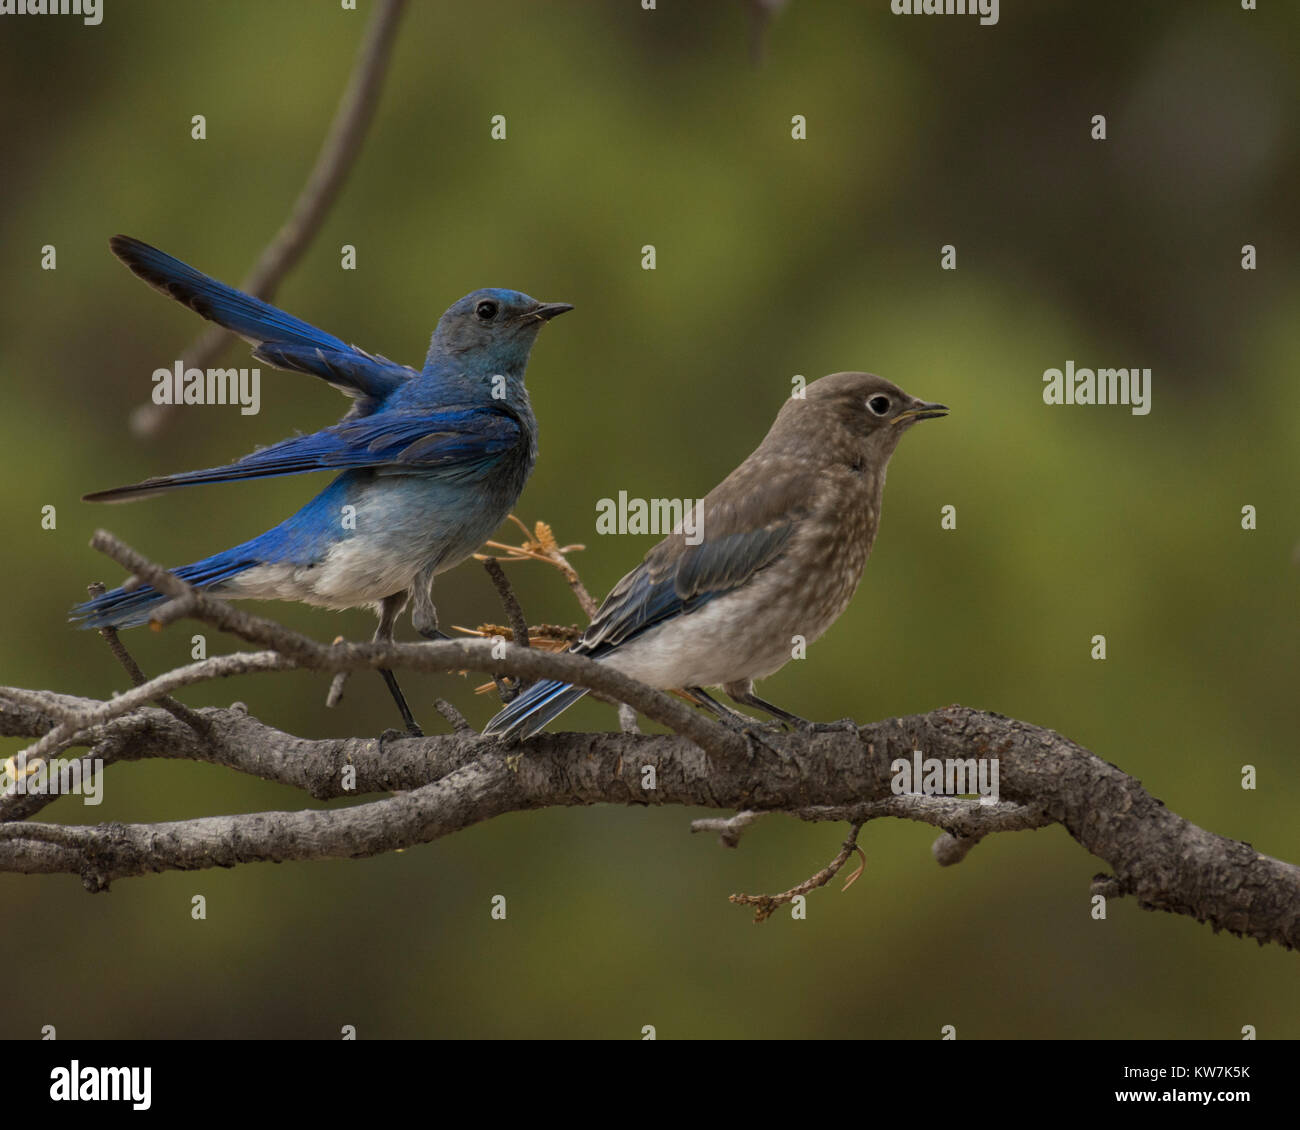 Fledgling Bluebird Stock Photos & Fledgling Bluebird Stock Images ...